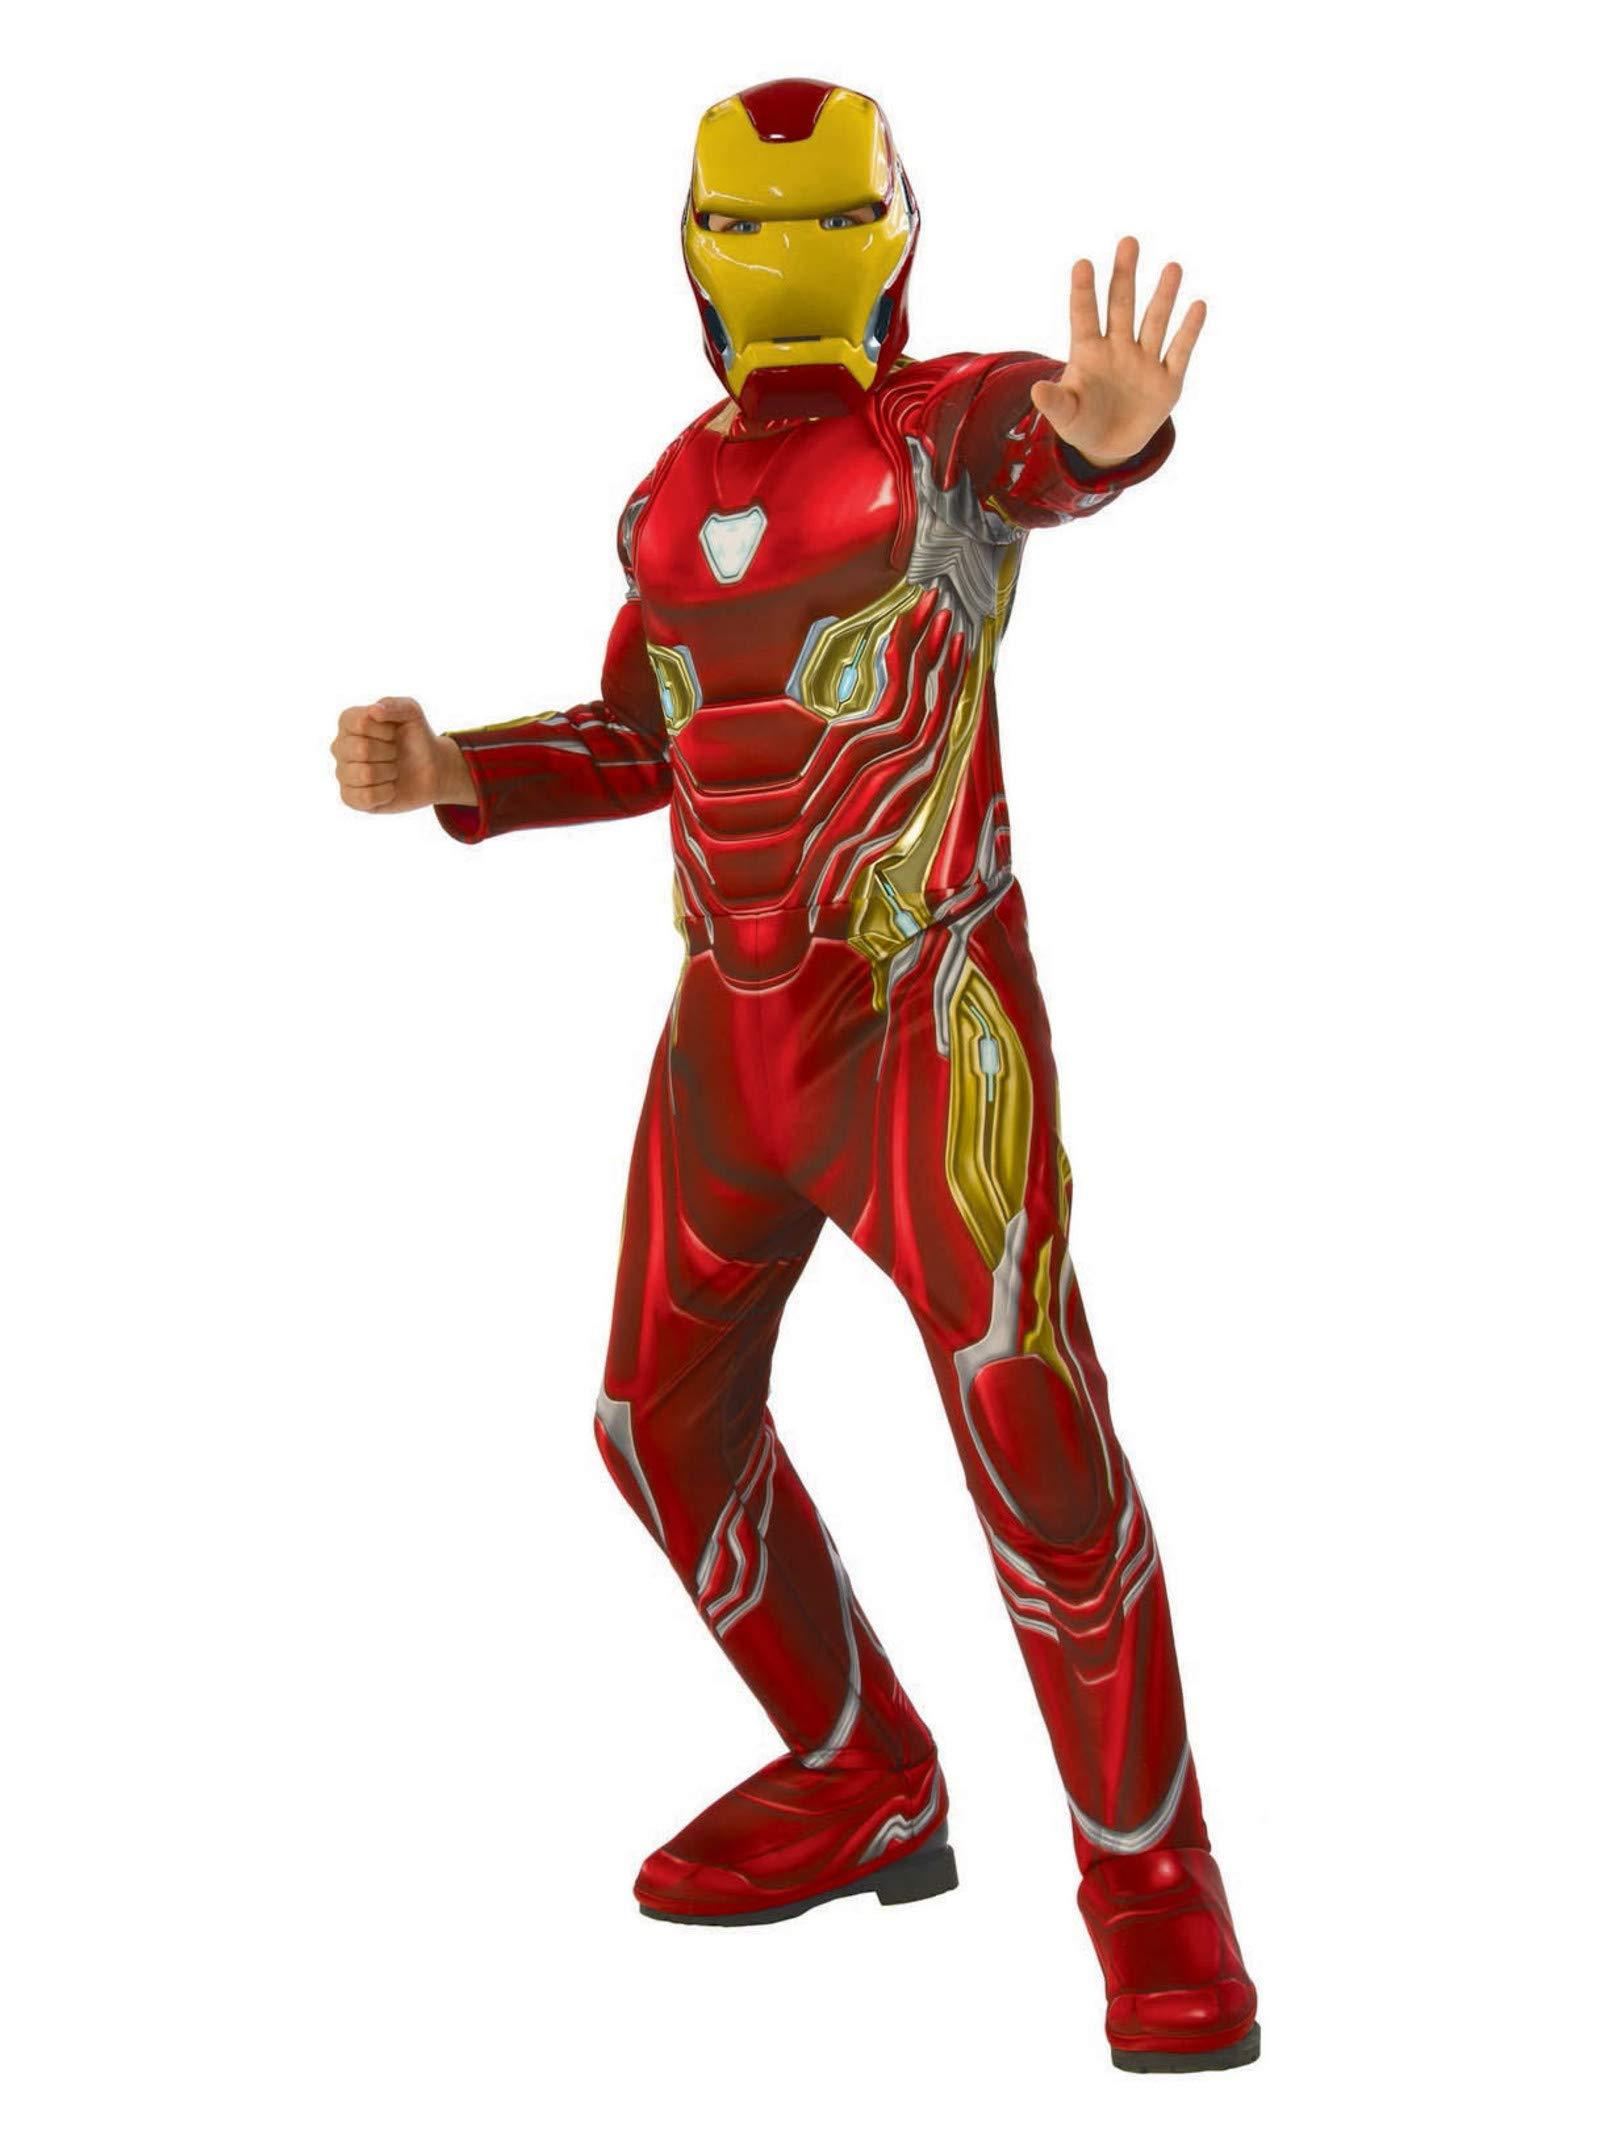 700649/_M ,As Shown Rubies Marvel Avengers: Endgame Childs Iron Man Costume /& Mask Medium